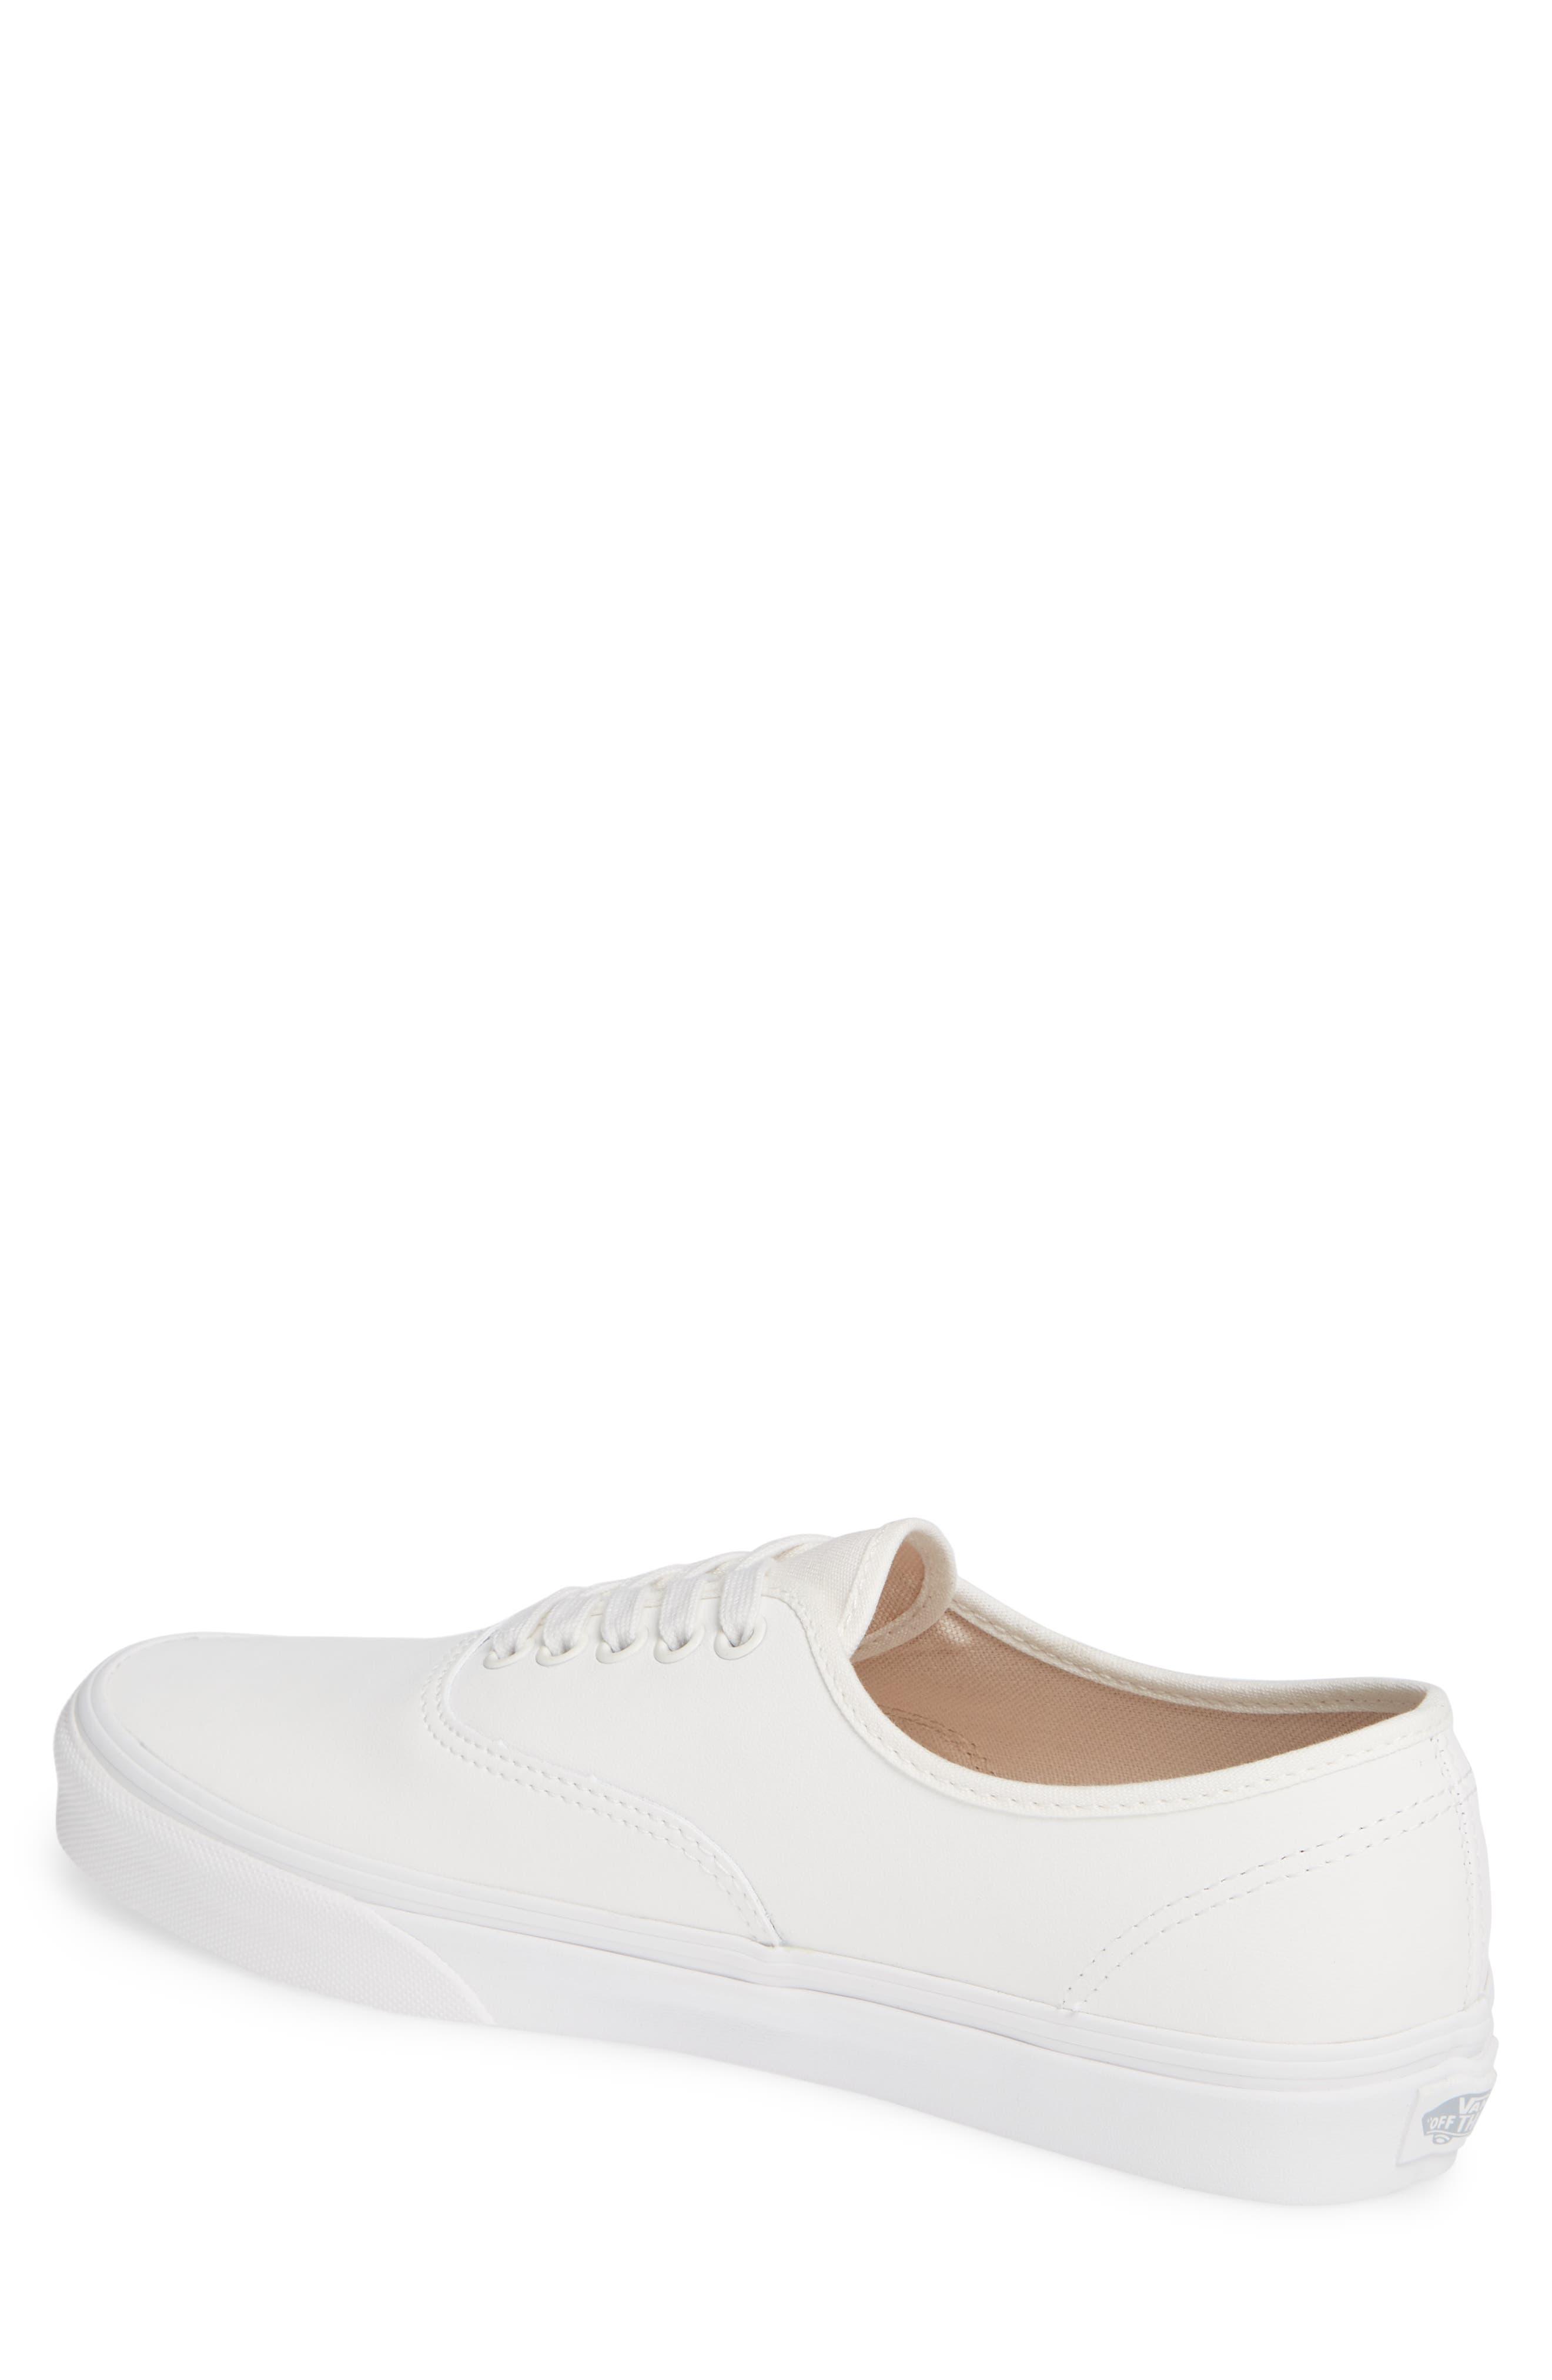 Authentic Buck Sneaker,                             Alternate thumbnail 2, color,                             WHITE